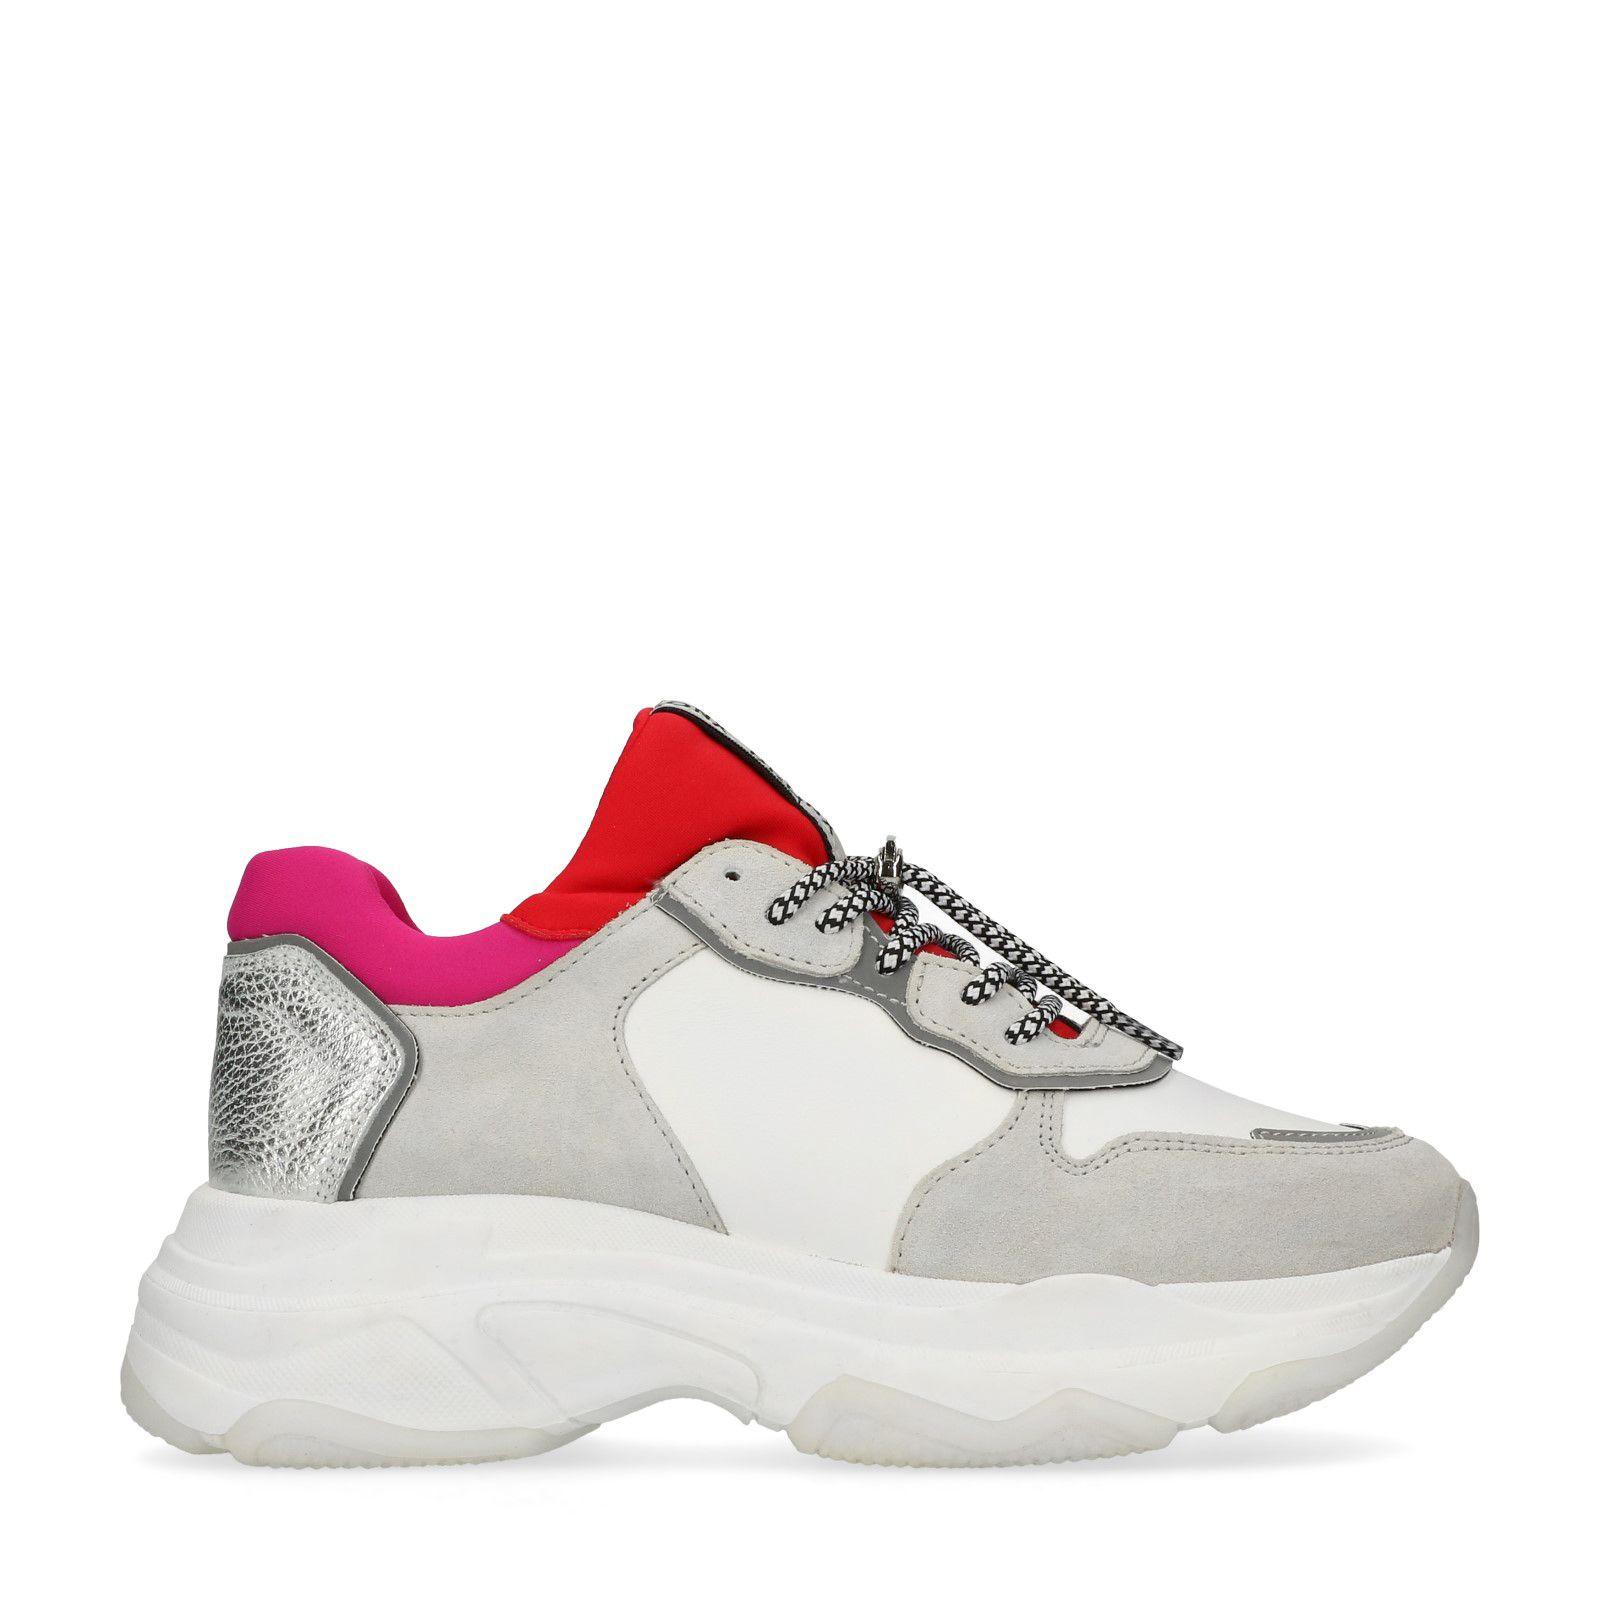 adidas Originals Dad shoes avec semelle plateau remise vraiment Wiki Rabais hjB8QGwGB